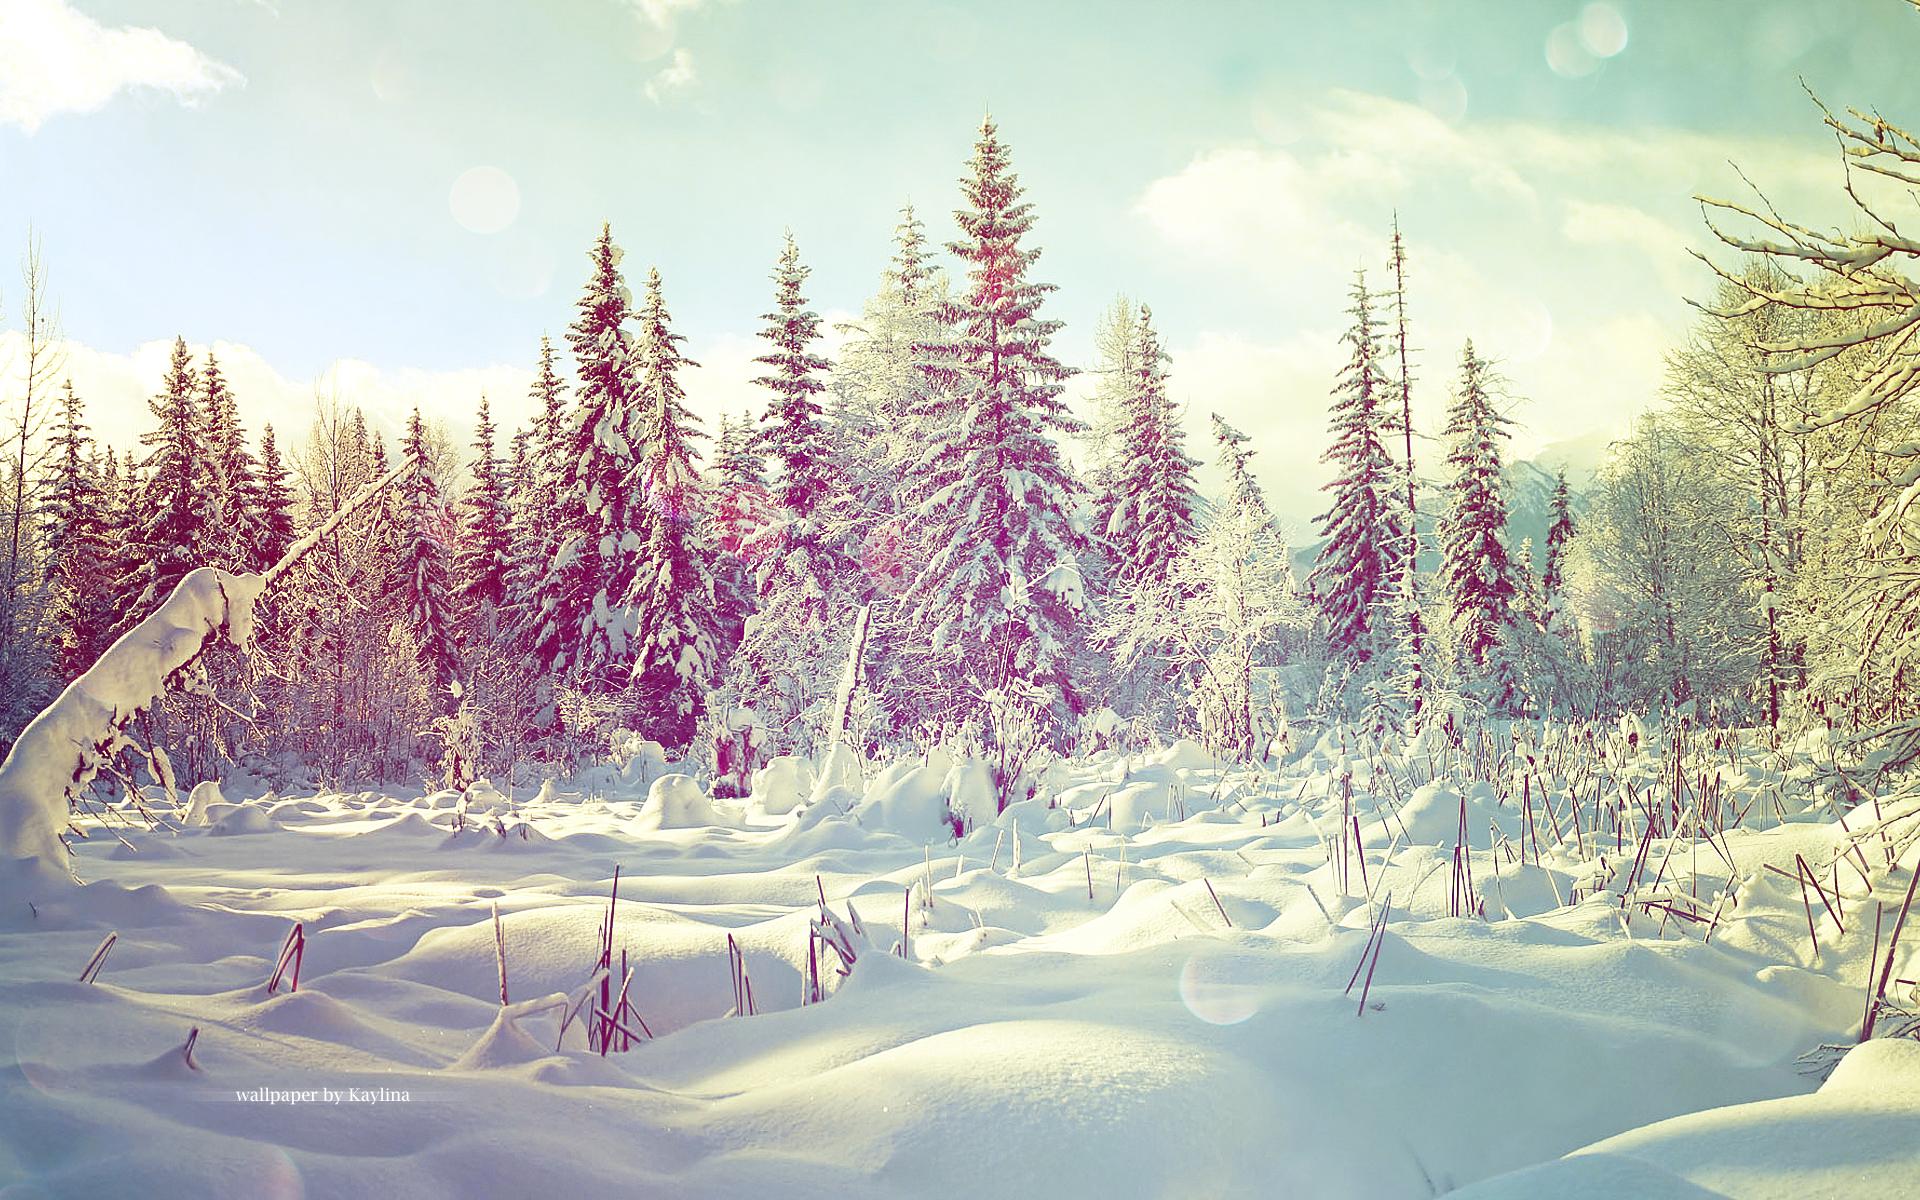 Winter wallpaper by Kaylina on DeviantArt